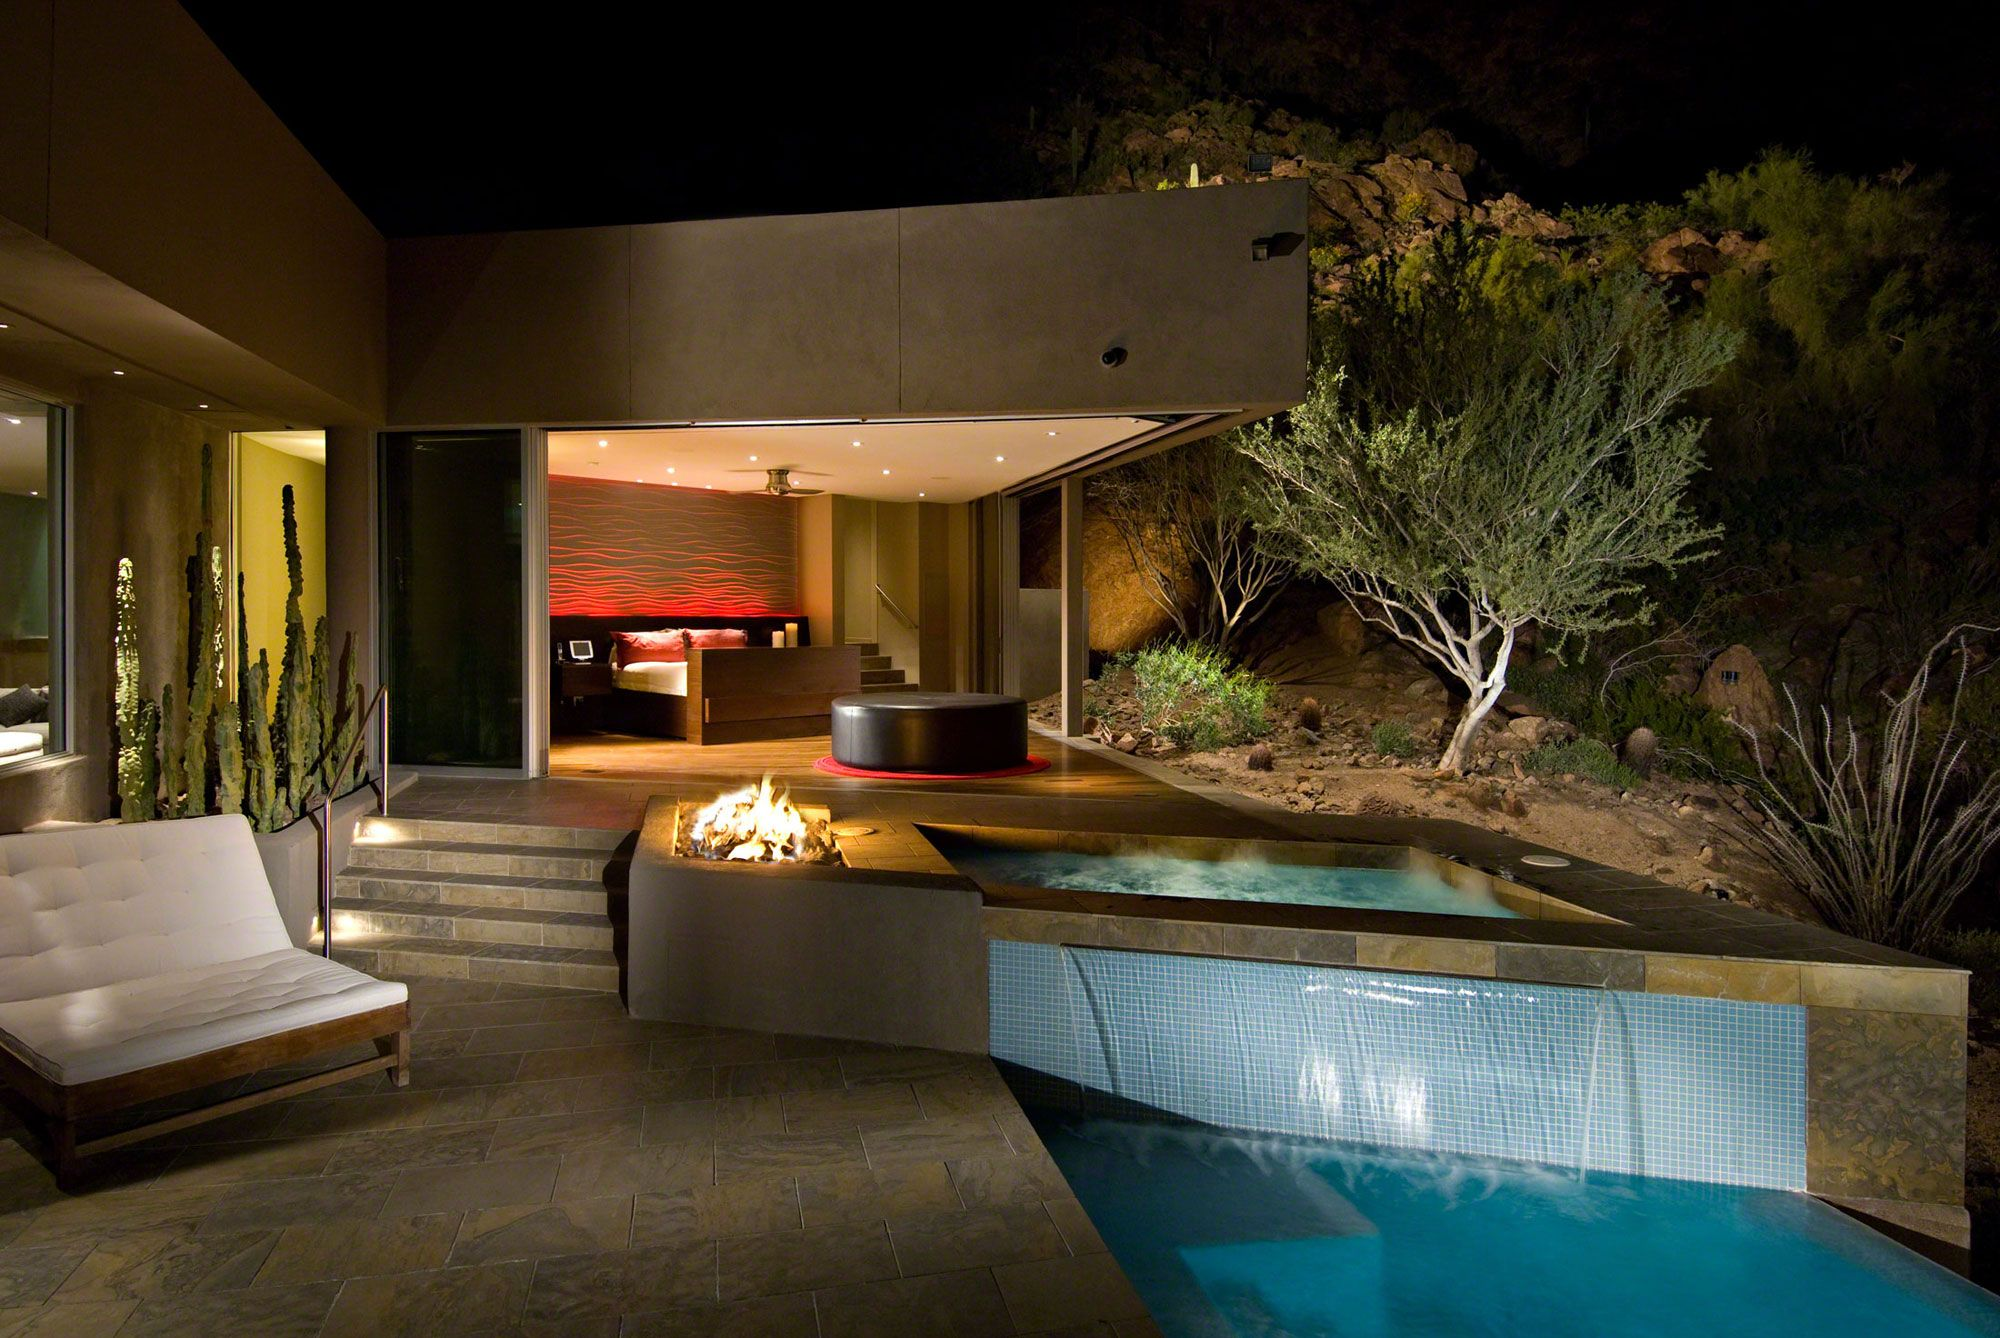 Arizona Custom Home Designs on arizona floor plans, arizona interior design, arizona real estate, arizona restaurants, arizona luxury homes, arizona desert, arizona homes design styles, arizona architecture,